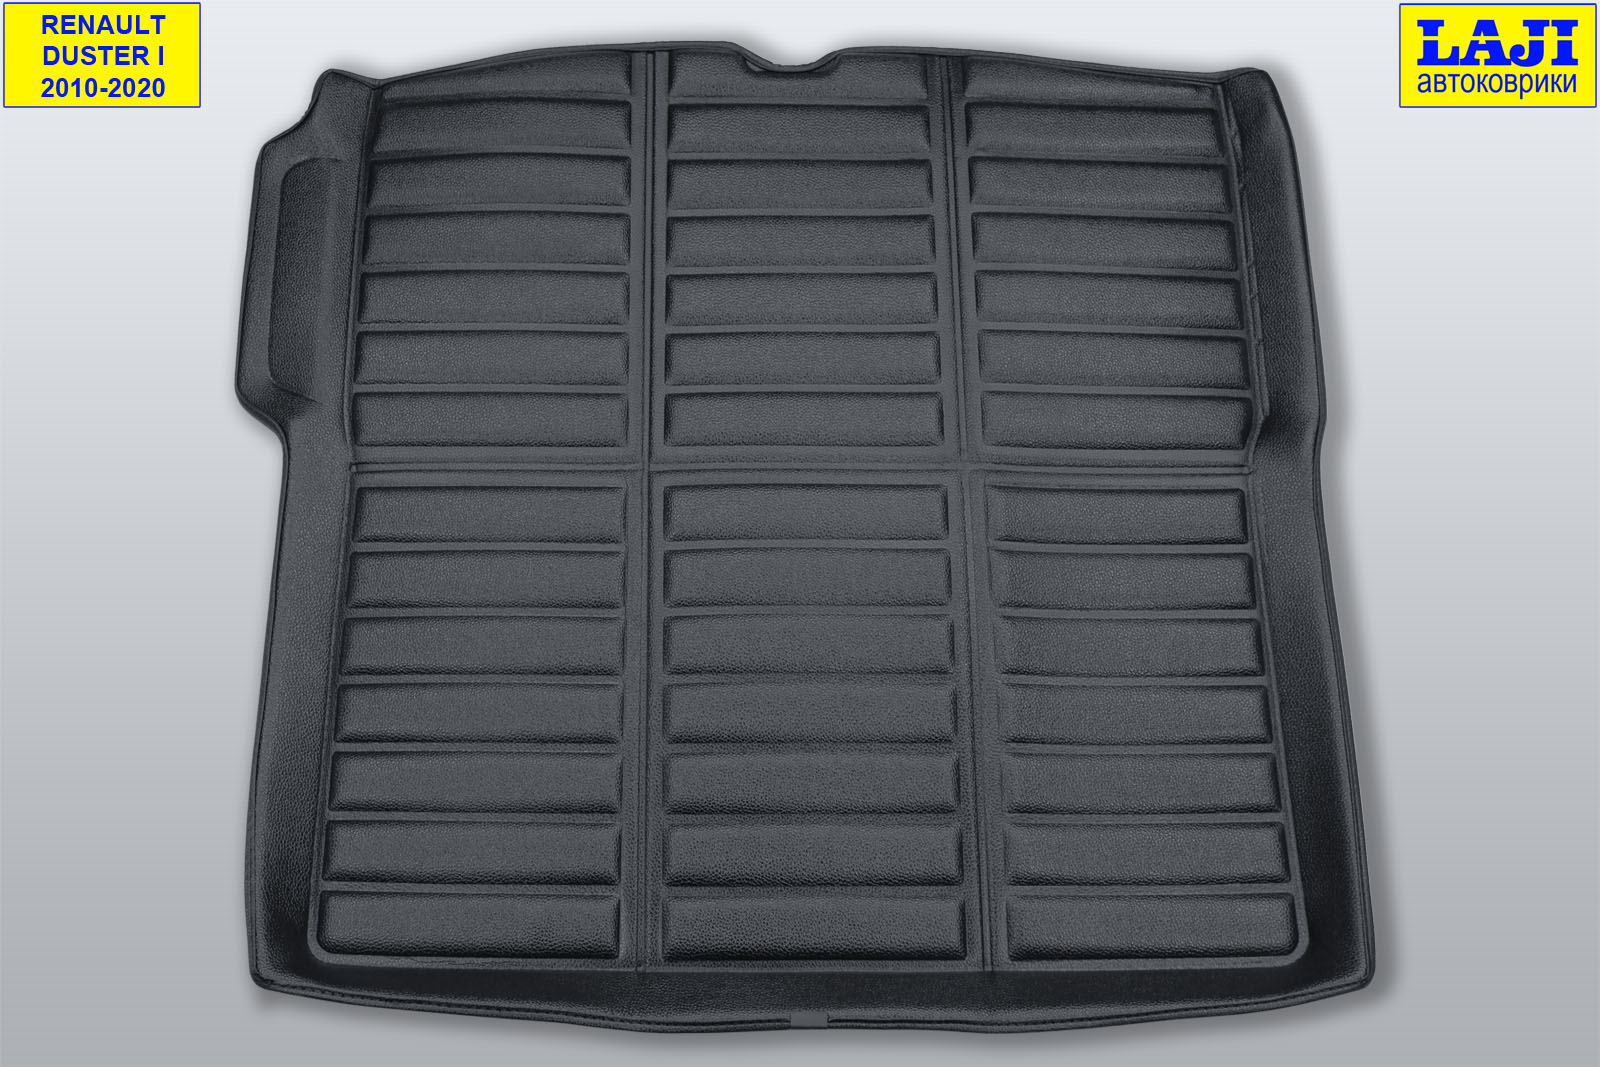 3D коврик в багажник Renault Duster 2010-2020 2